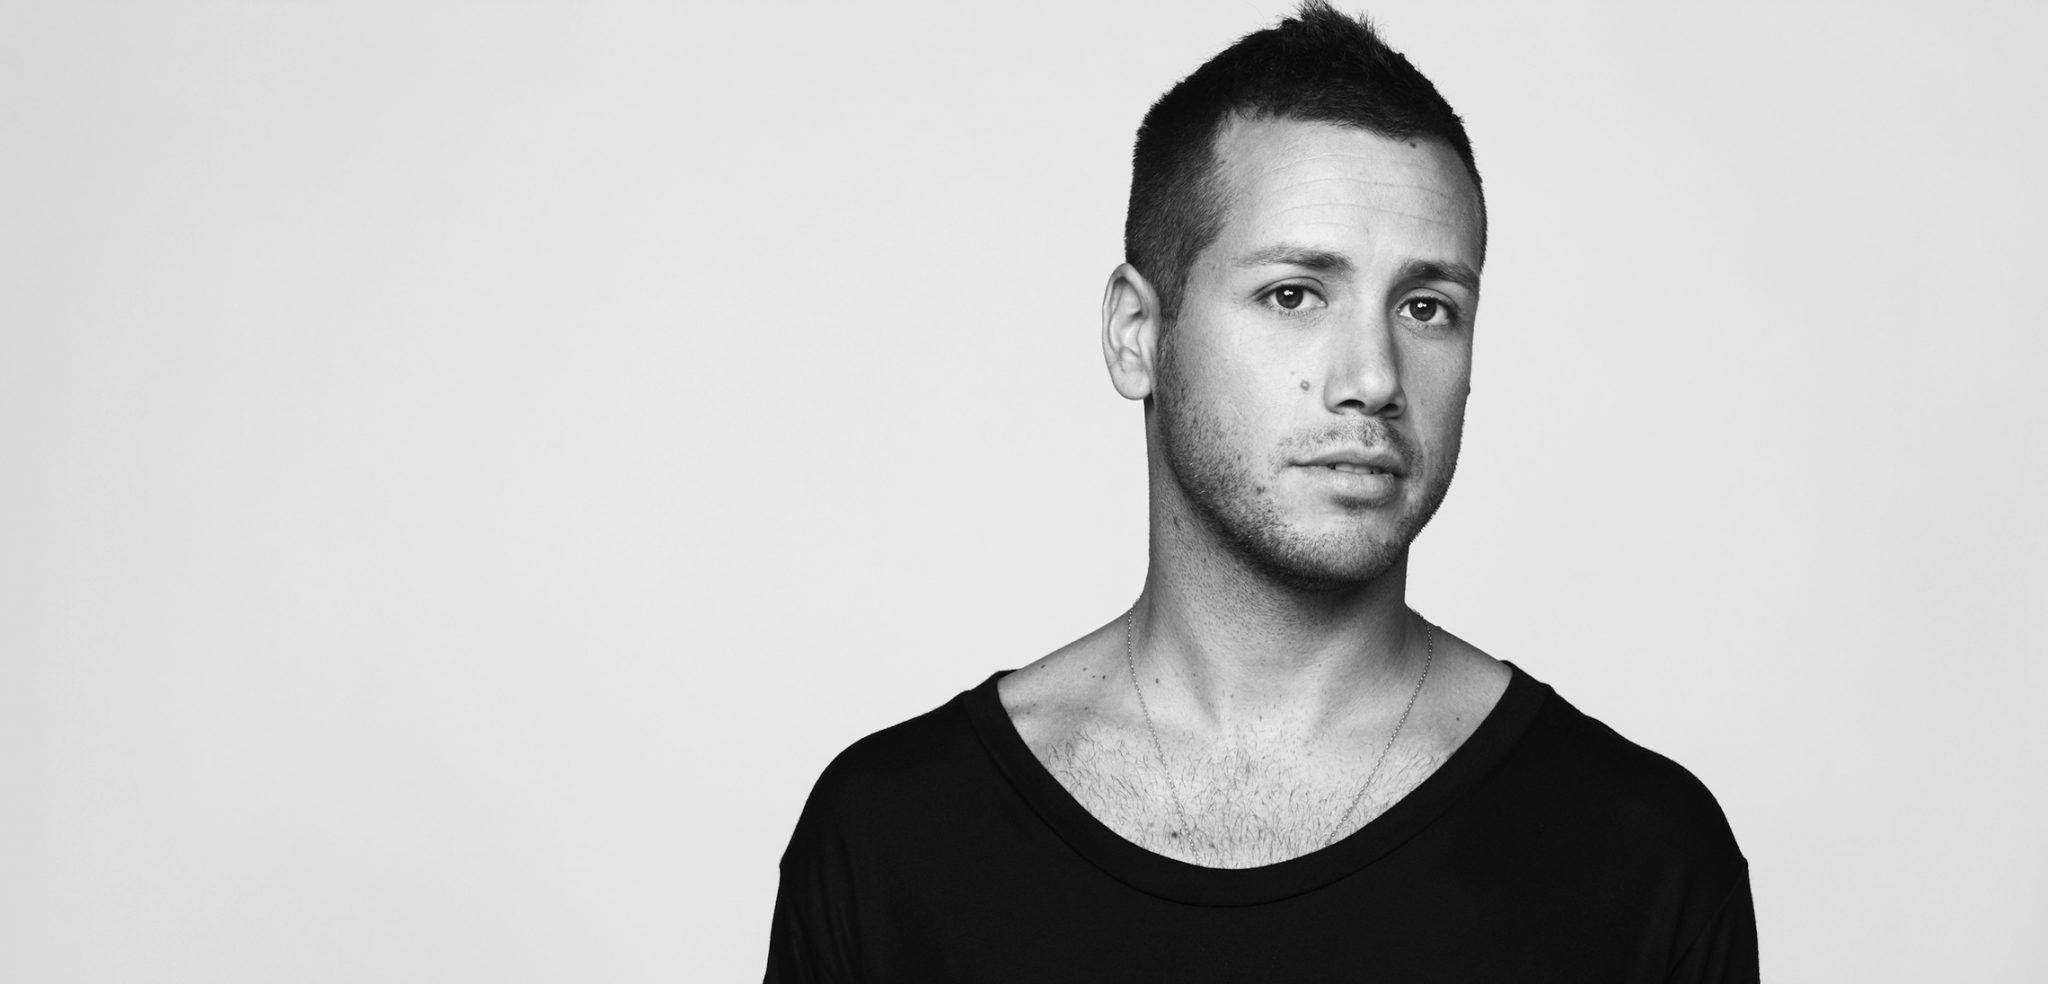 Francisco Allendes - Tirana EP hero